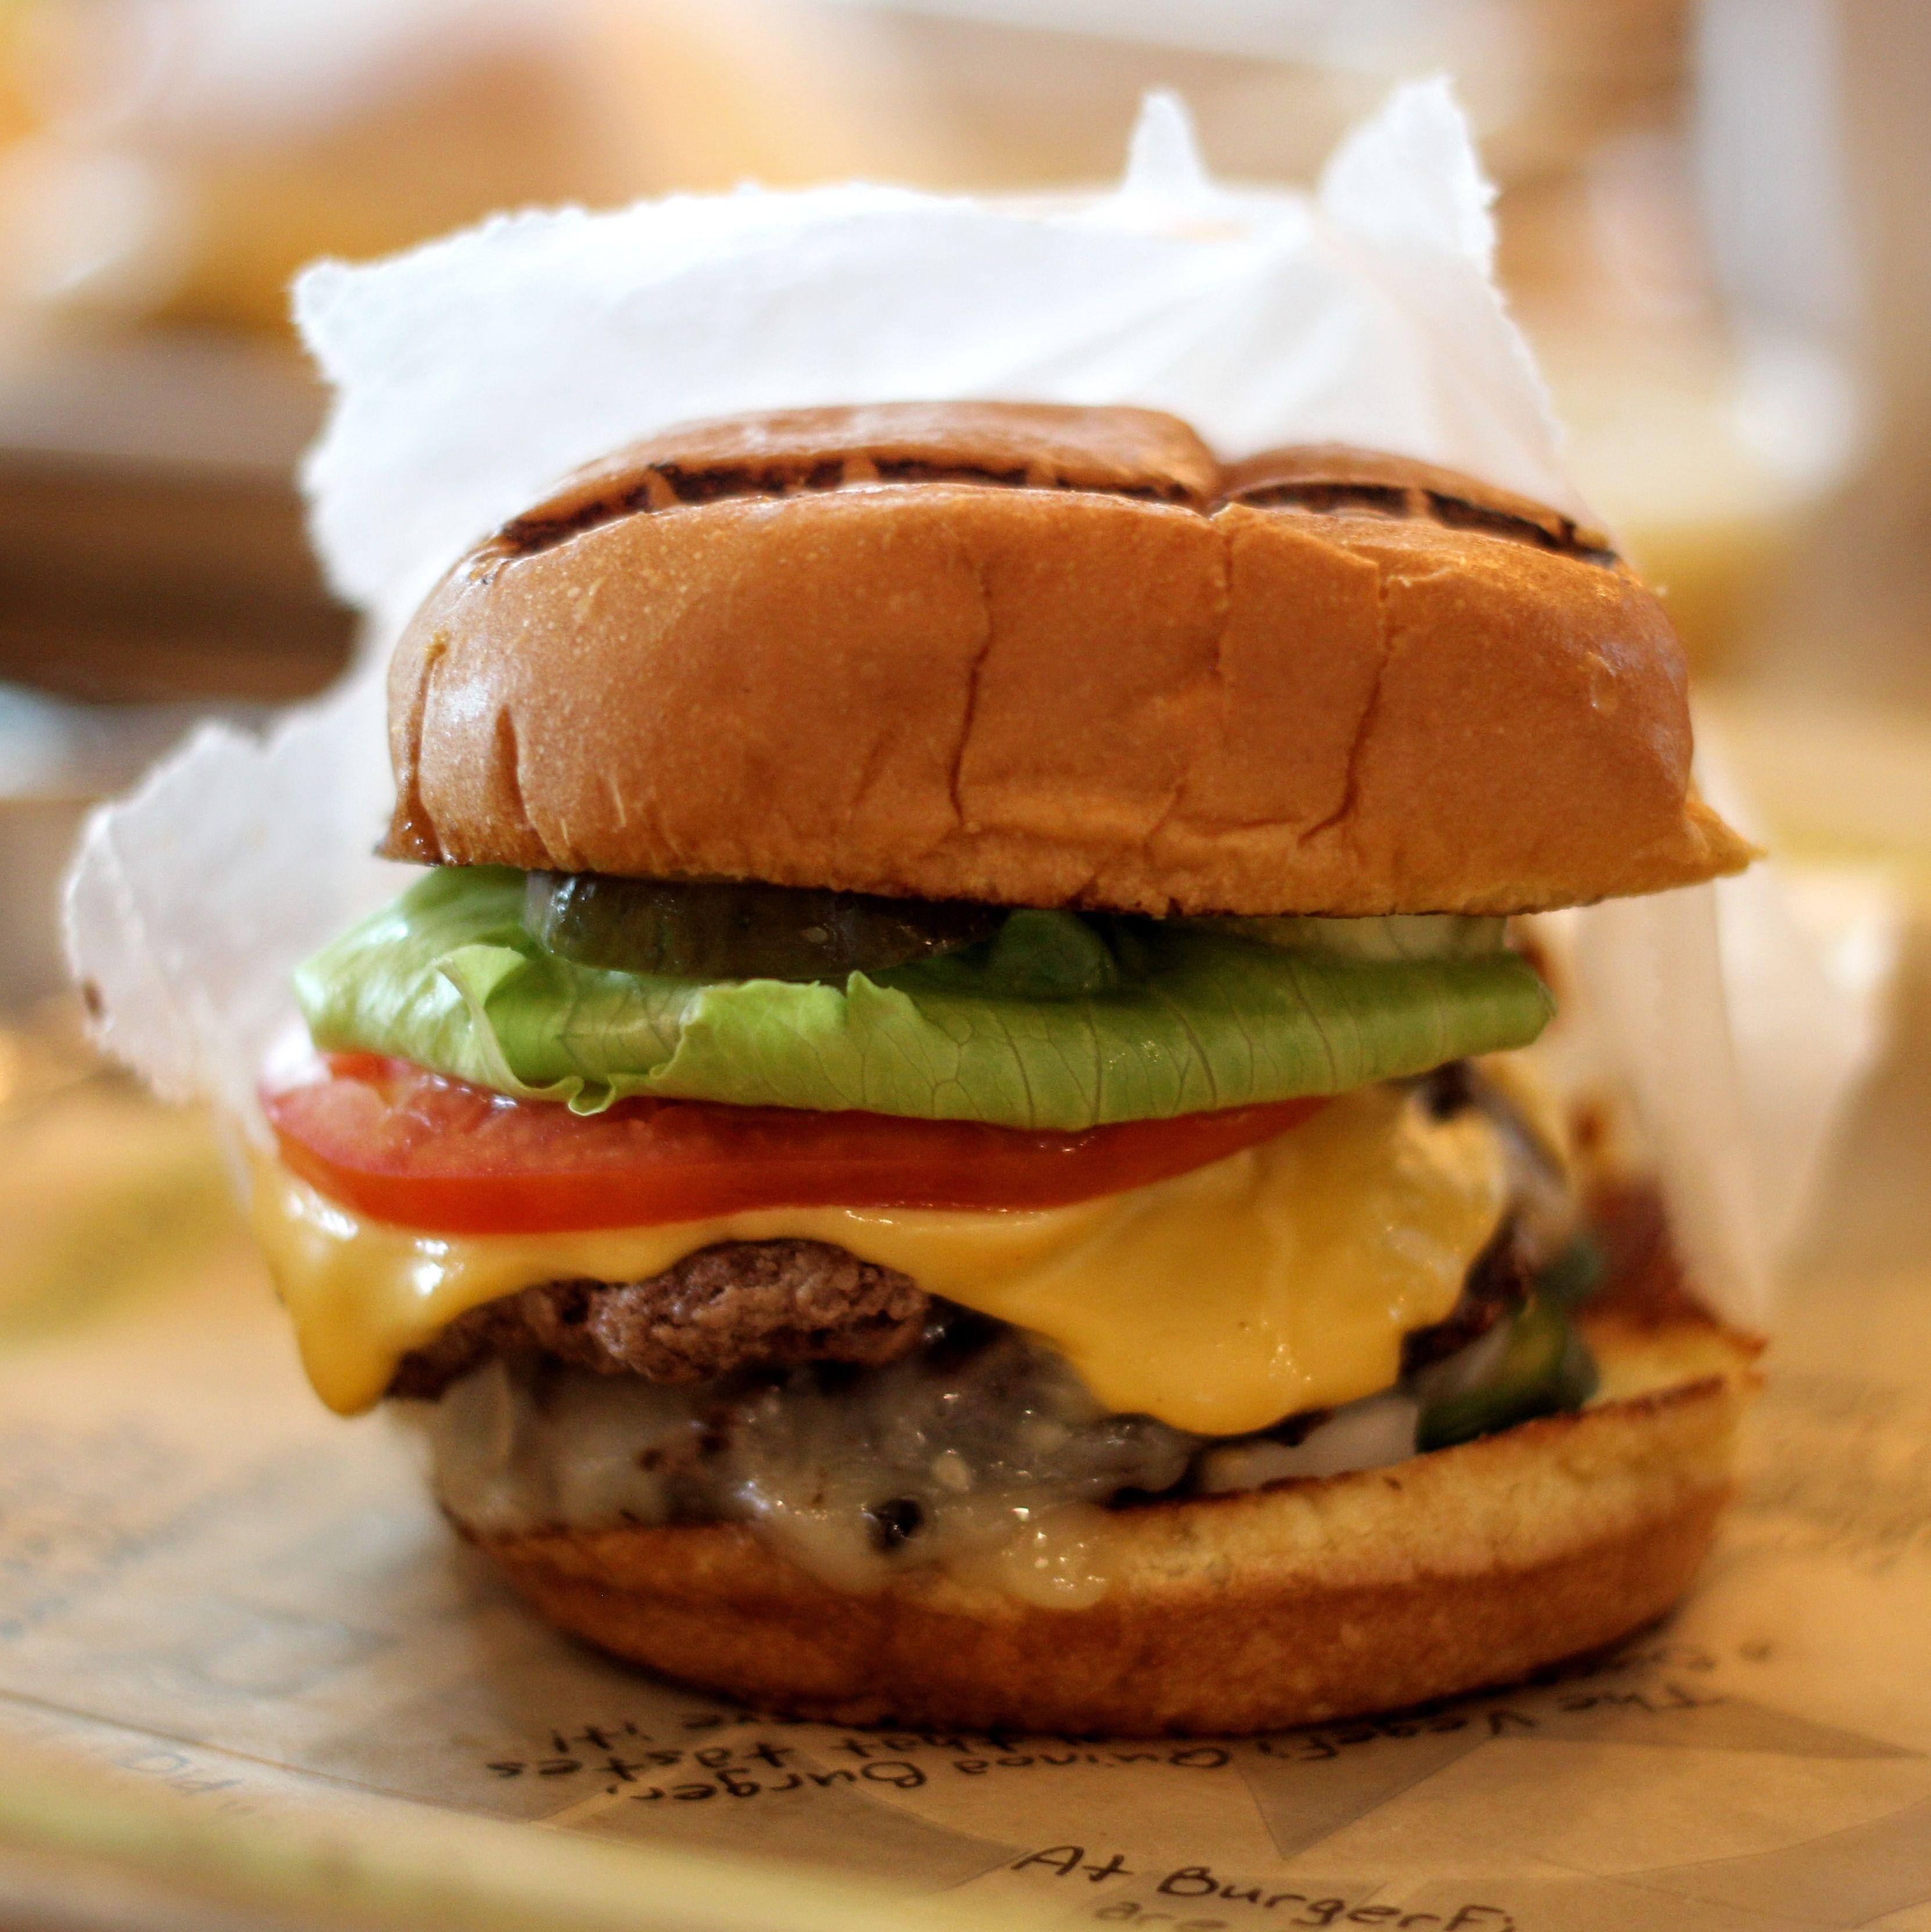 Burgerfi  1  ejcflr